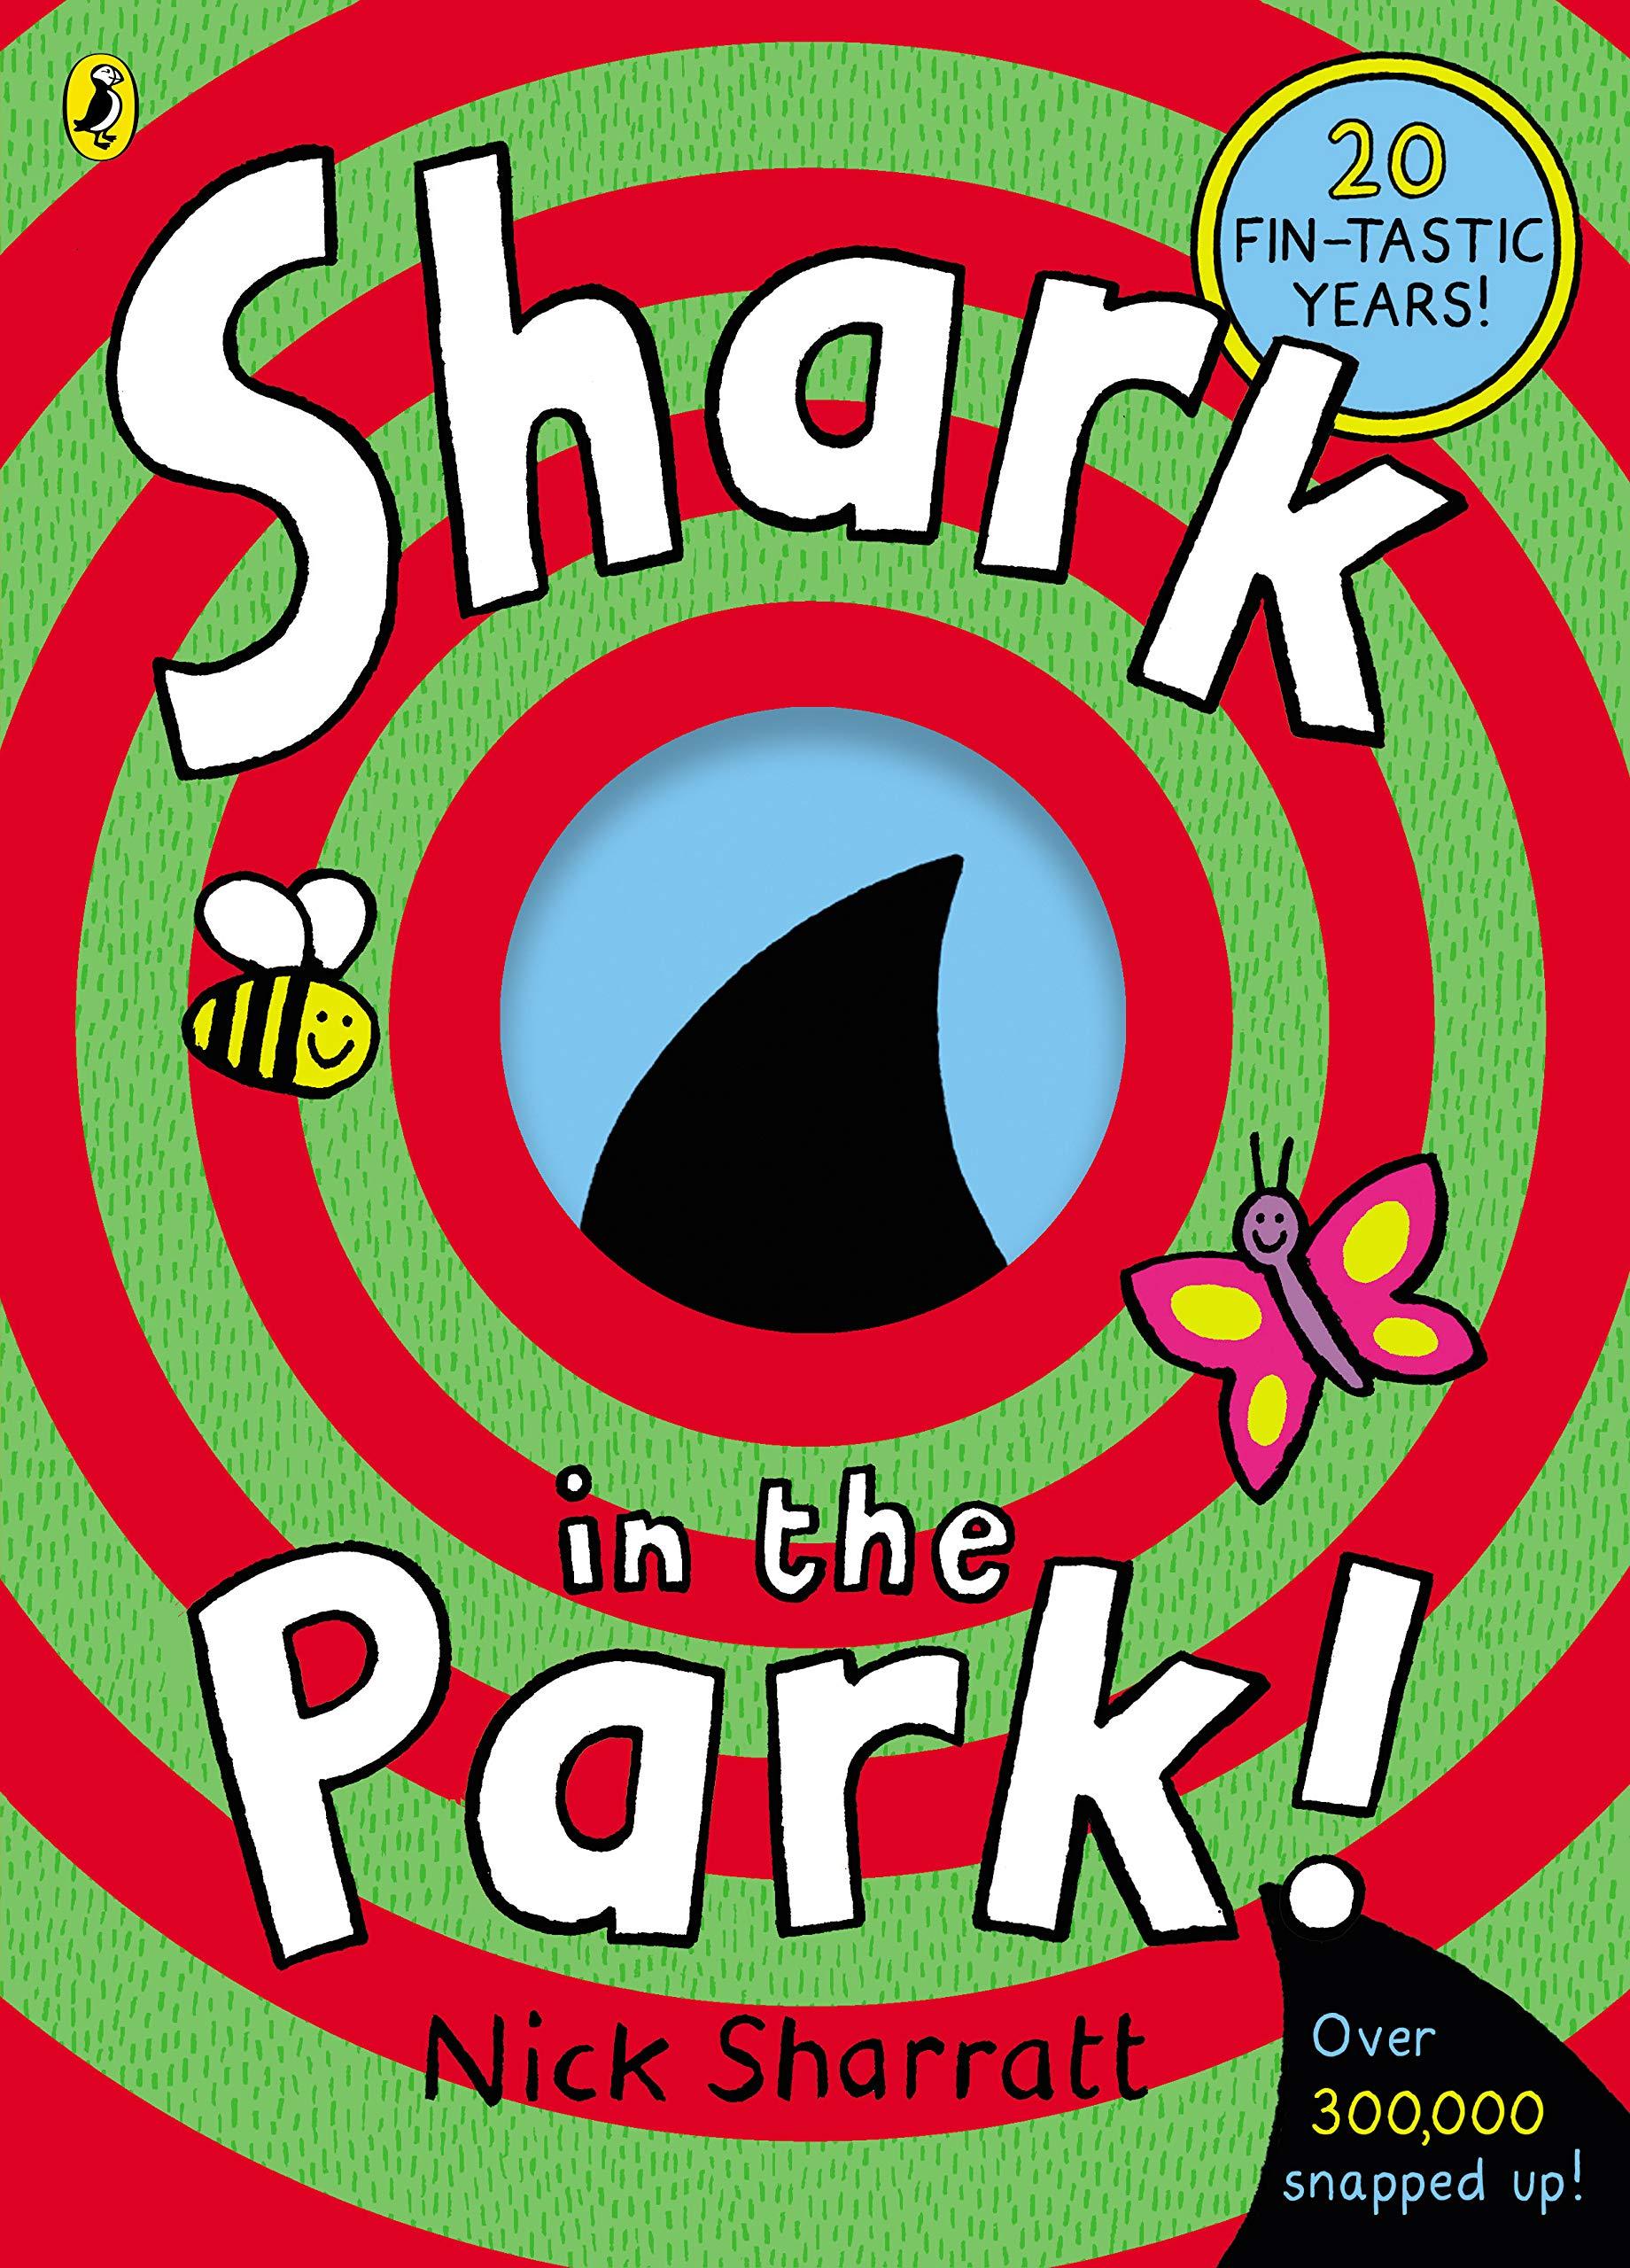 Shark In The Park : Sharratt, Nick, Sharratt, Nick: Amazon.co.uk: Books